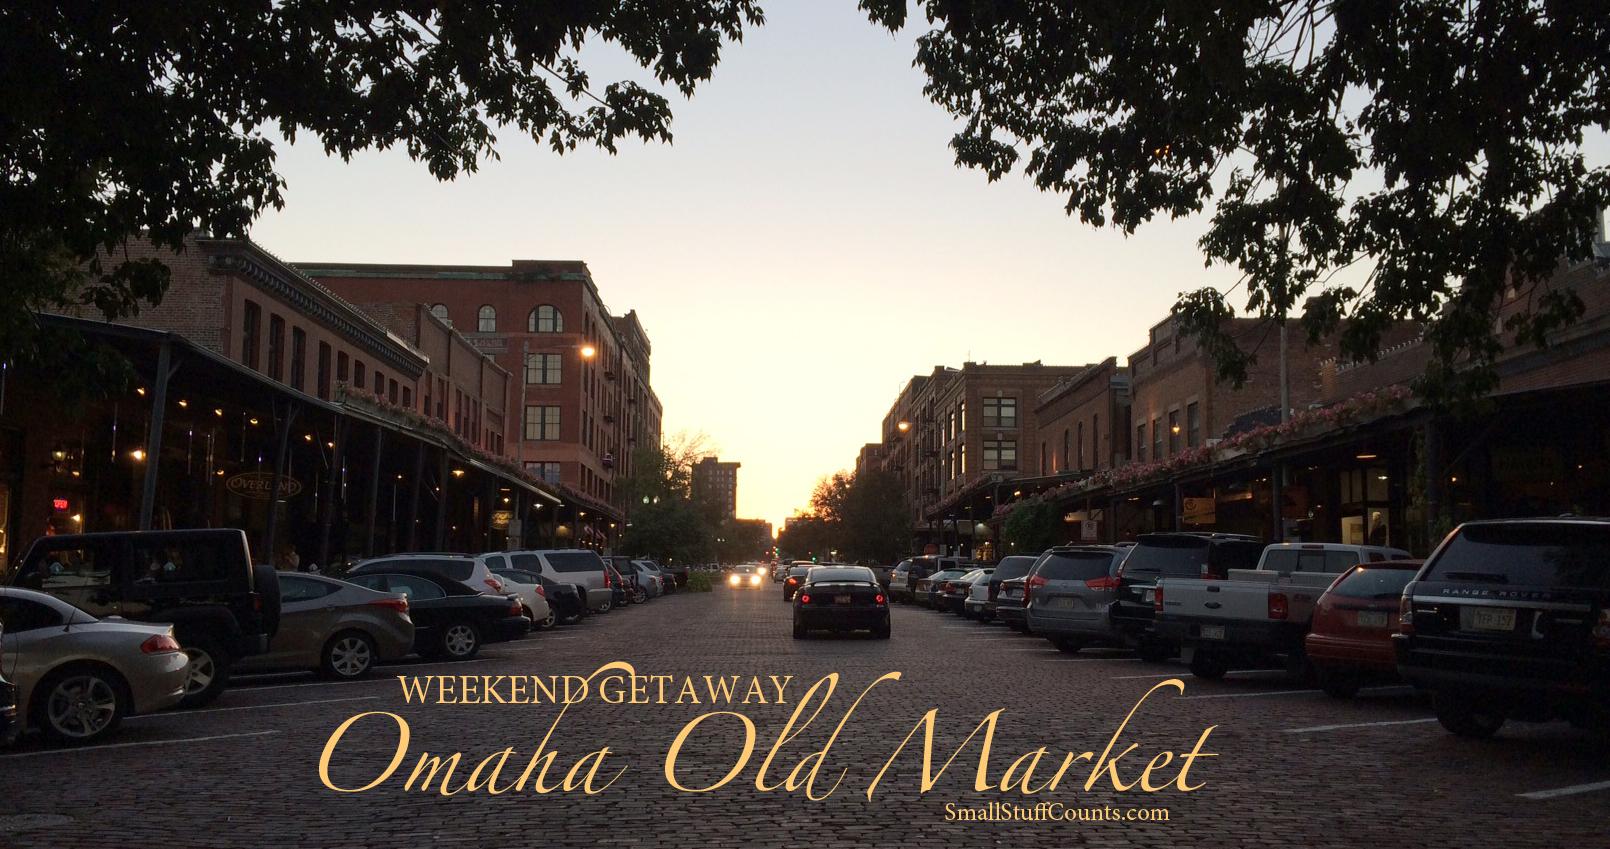 Weekend Getaway Omahas Old Market Small Stuff Counts